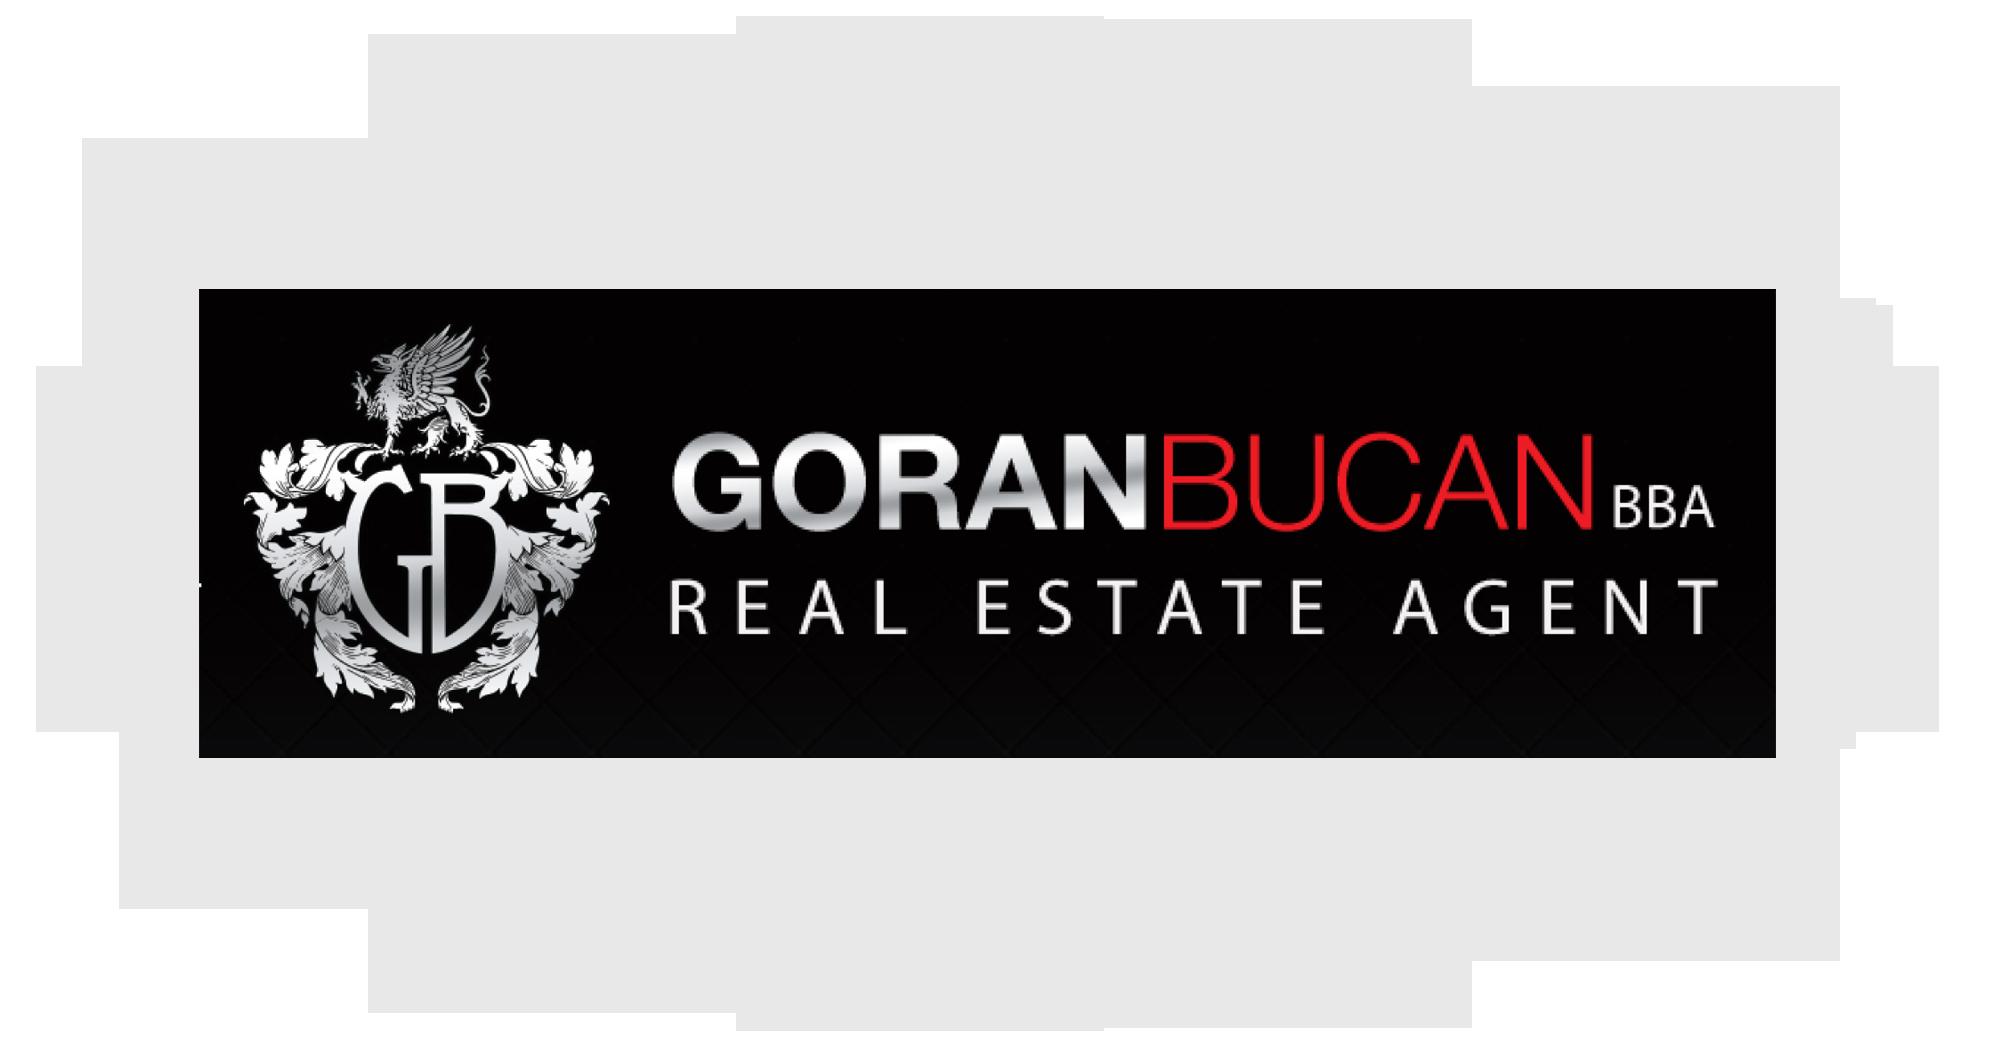 Goran Bucan